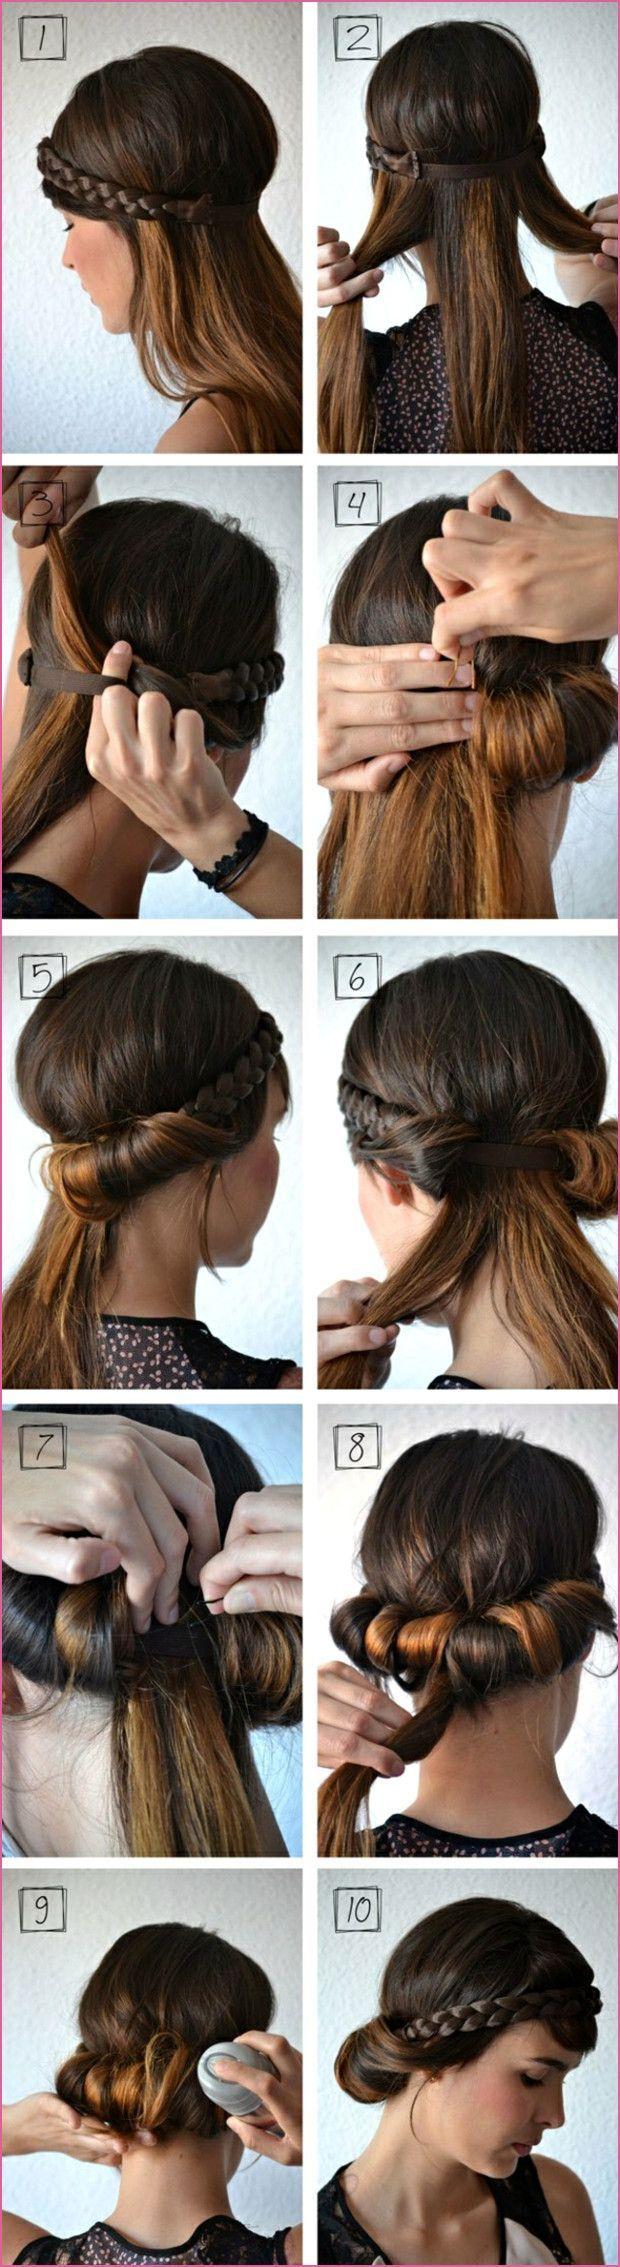 Frisuren Mittellang Flechten In 2020 Headband Hairstyles Long Hair Styles Hair Styles